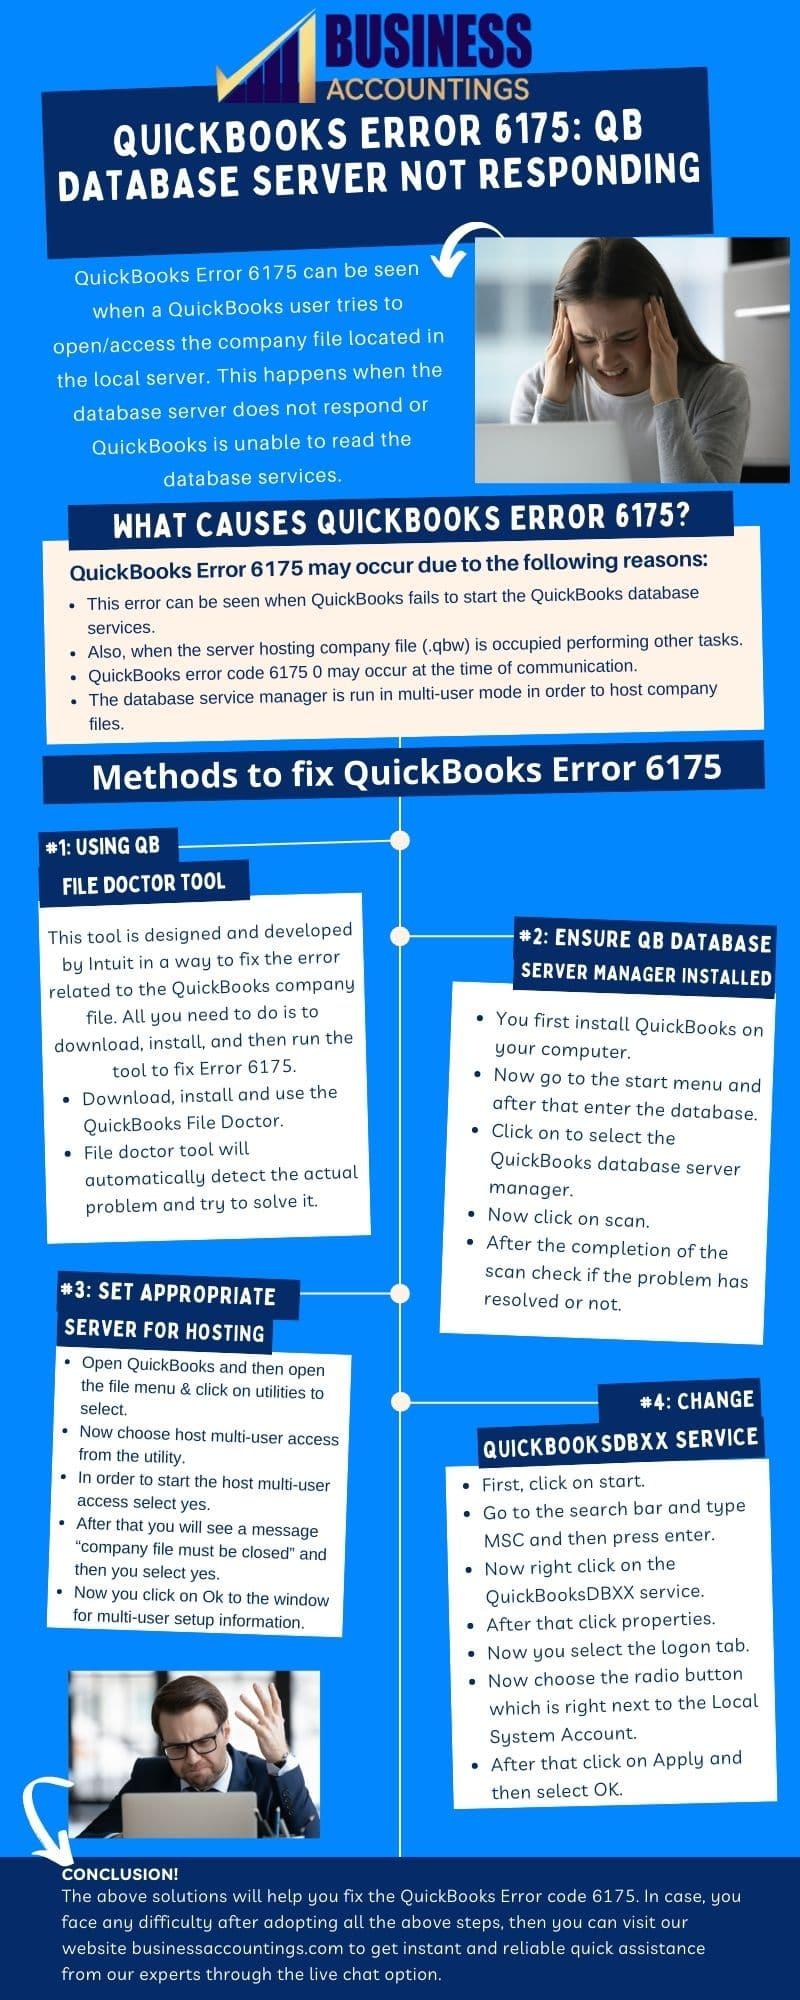 Infographics of Solutions to QuickBooks Error Code 6175